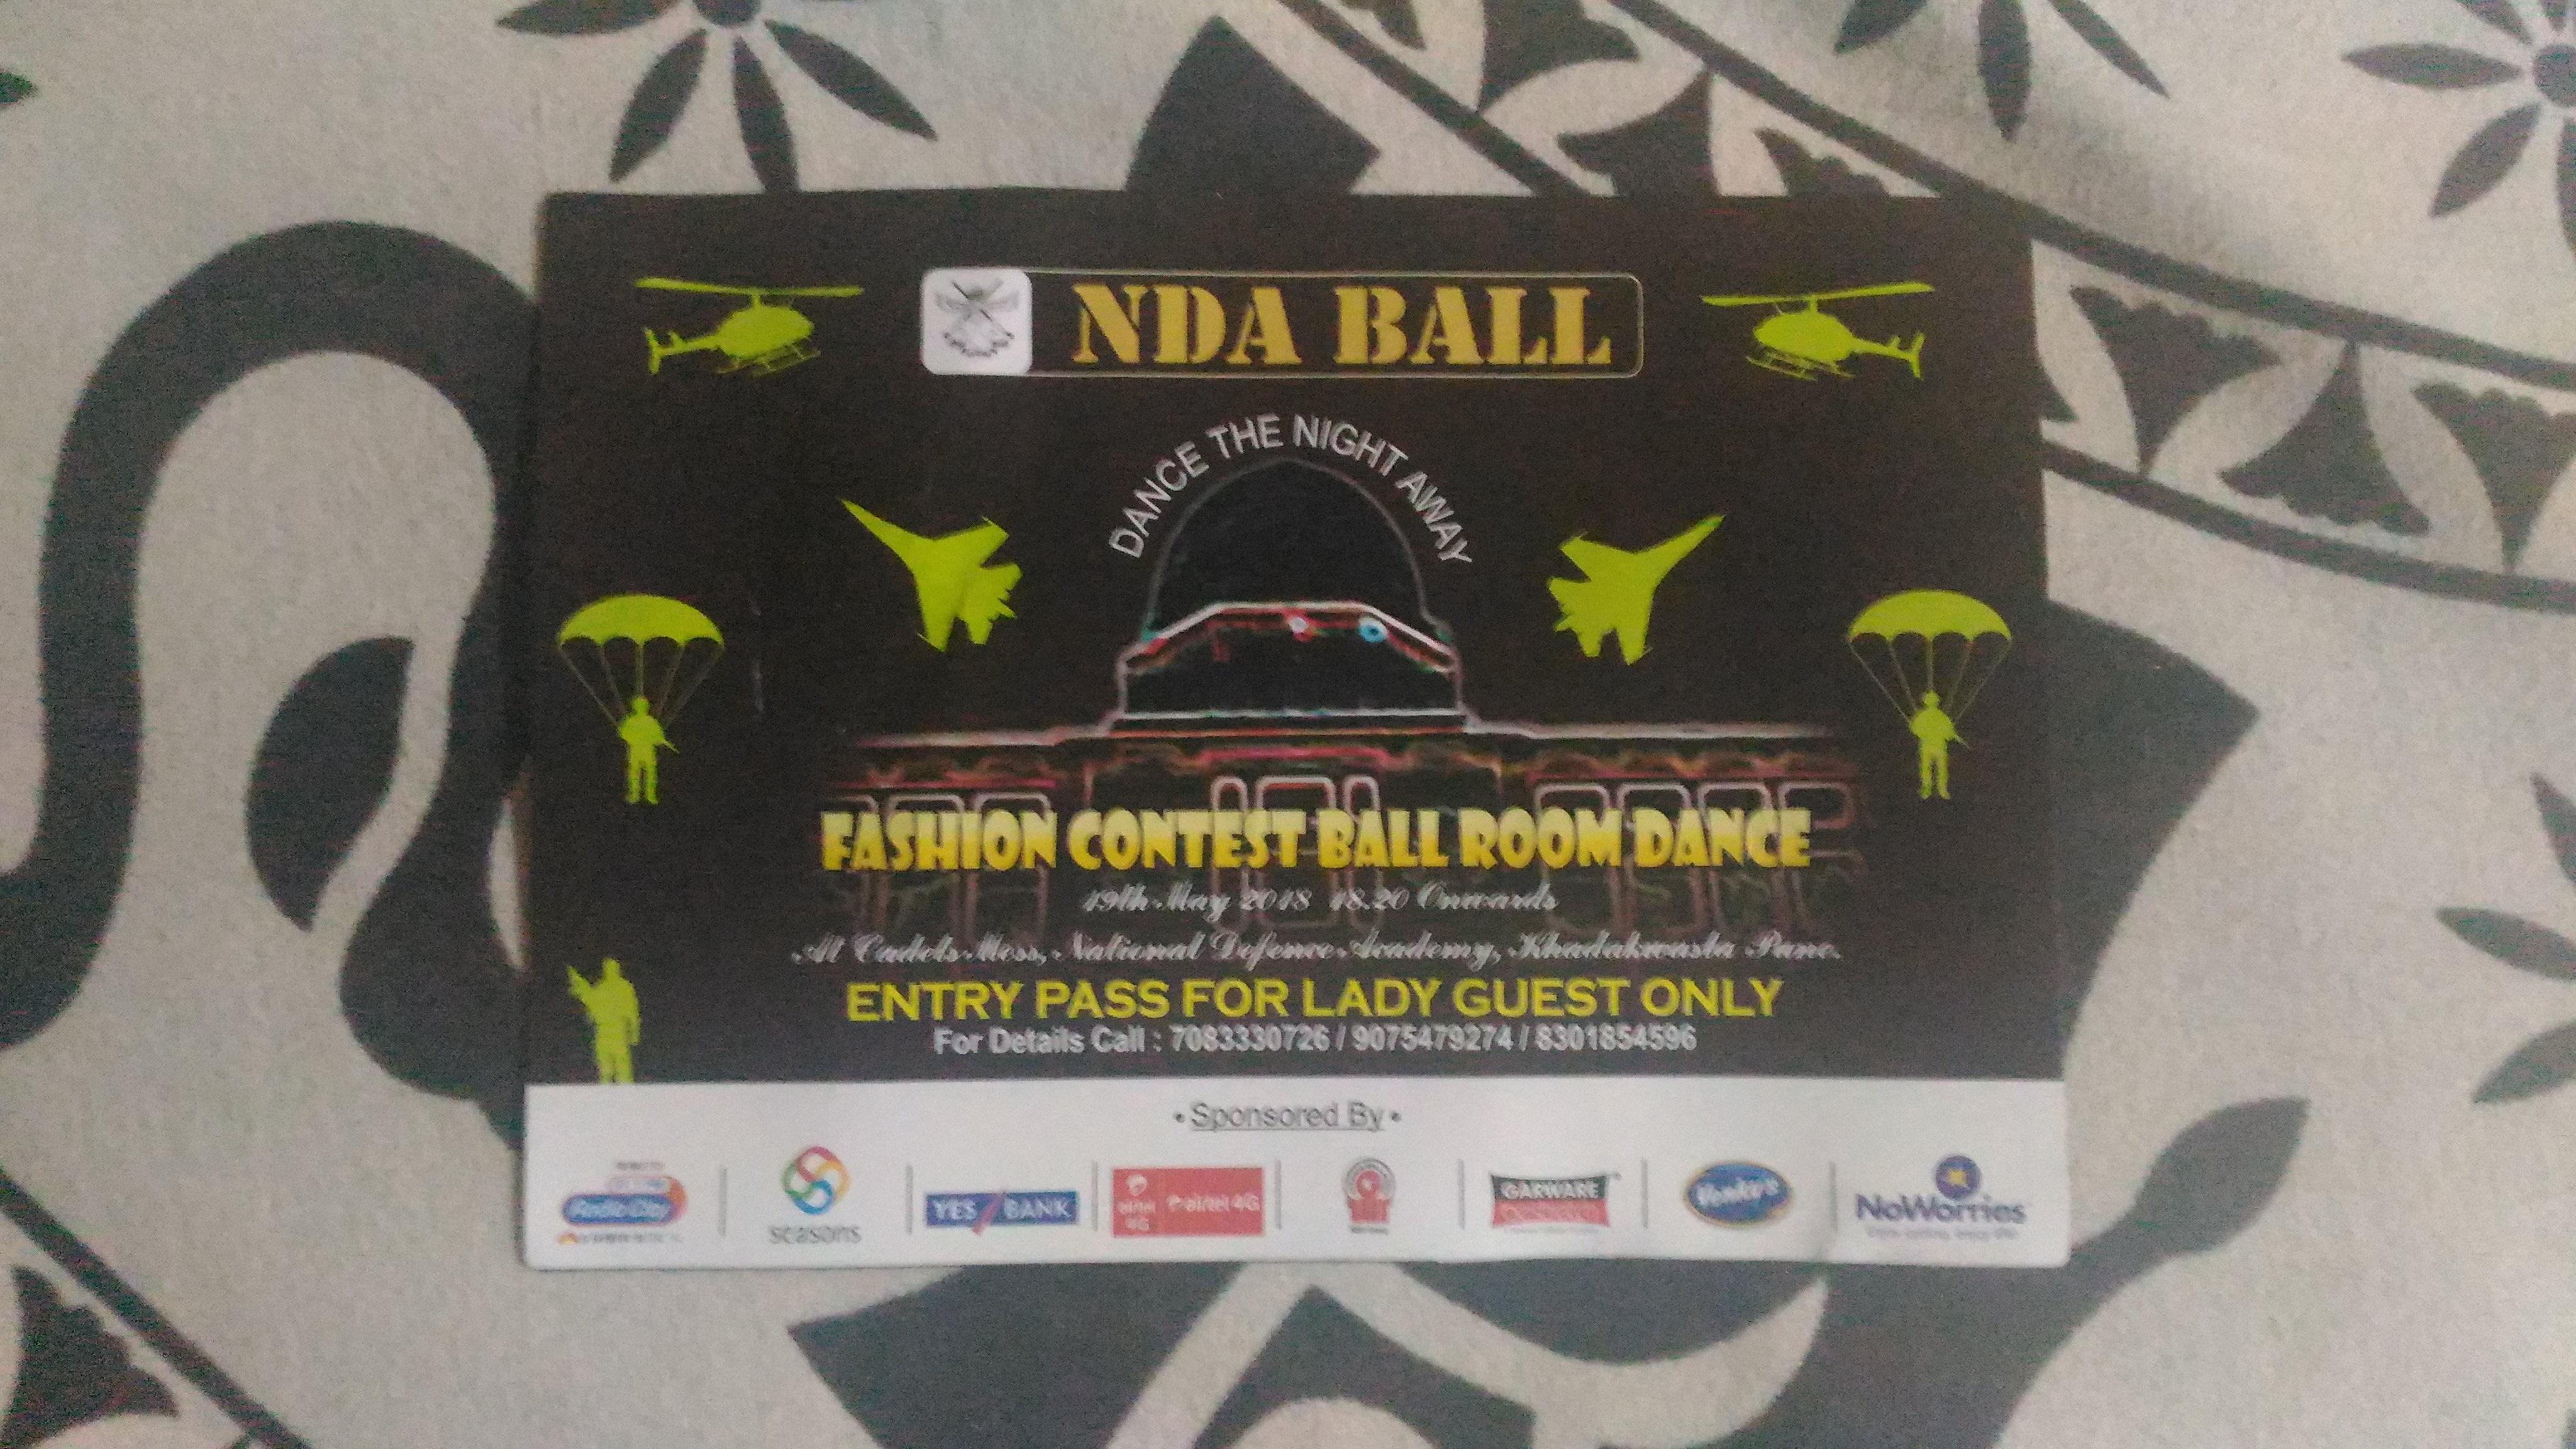 NDA Ball Entry Pass